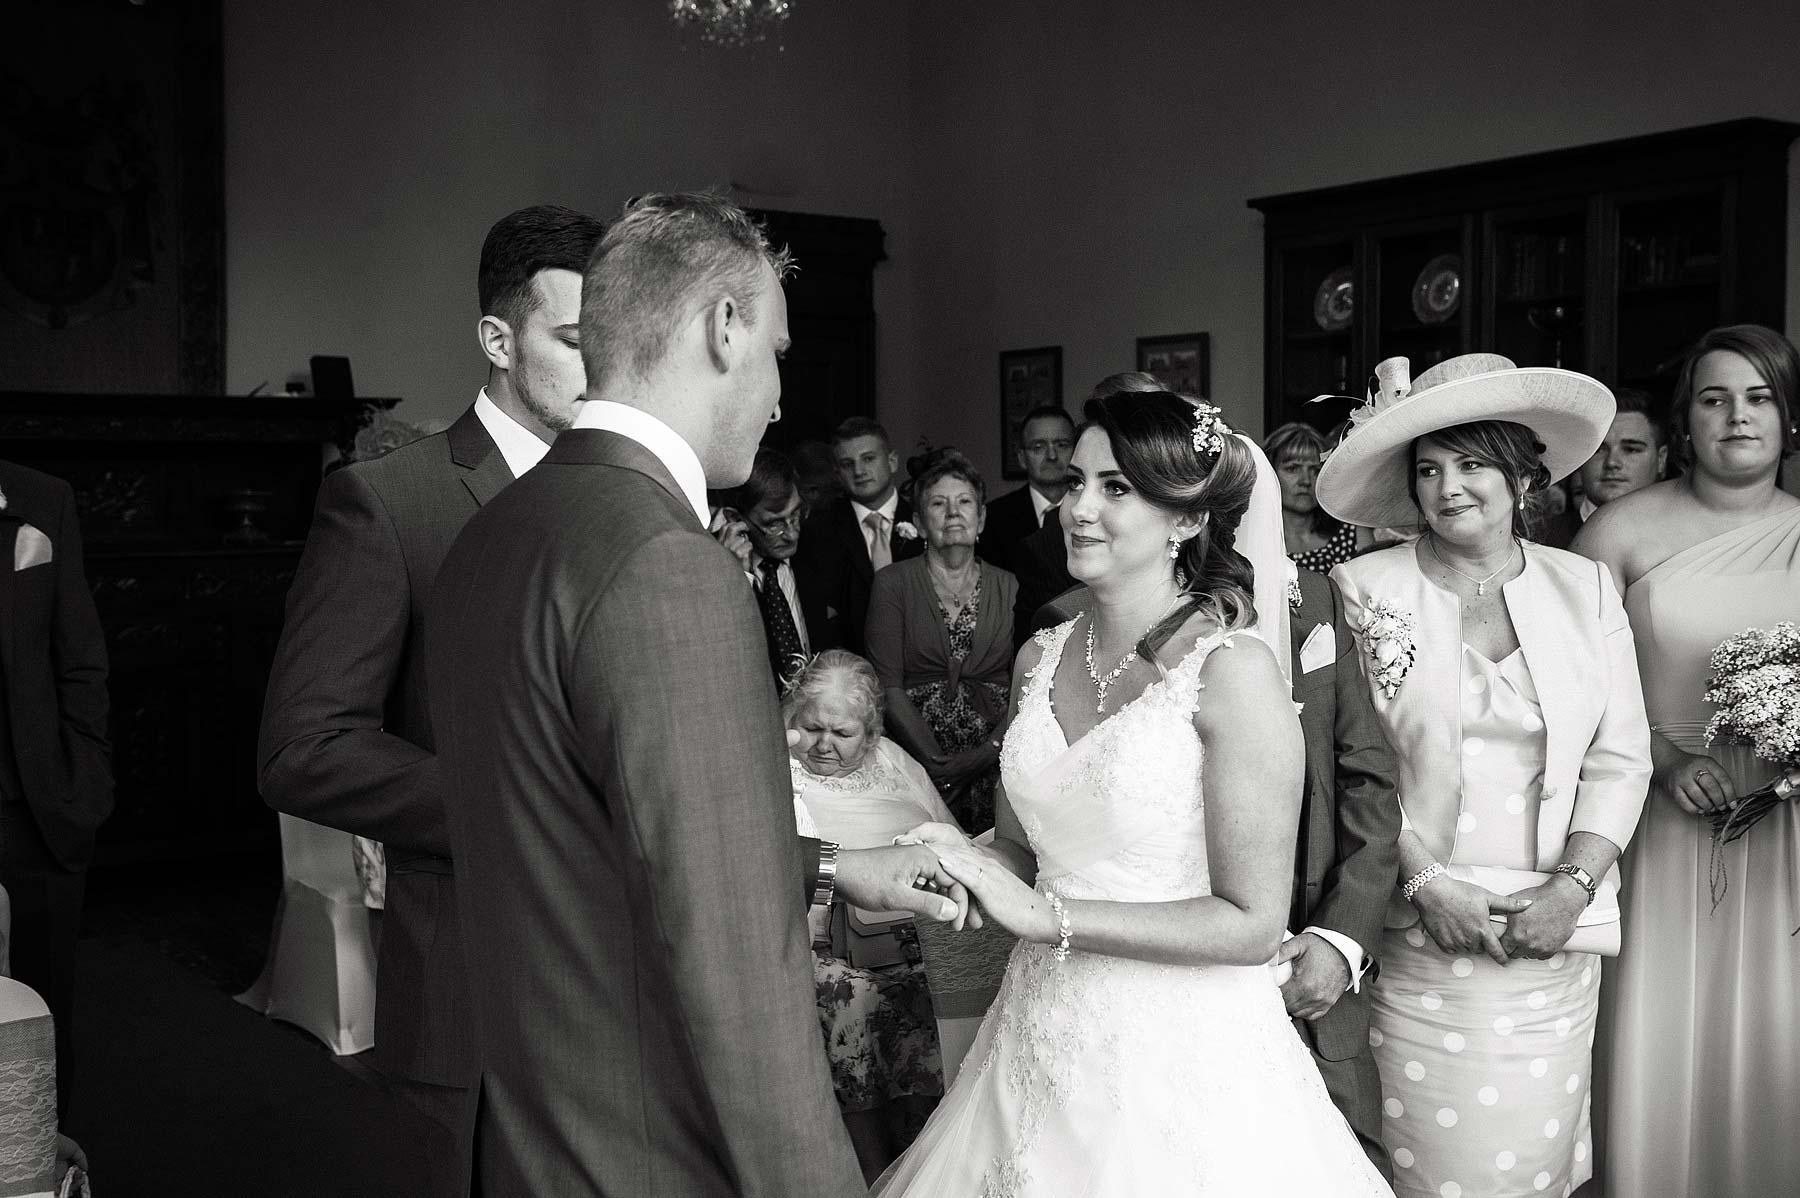 hawkesyard-estate-wedding-photographers-rugeley-035